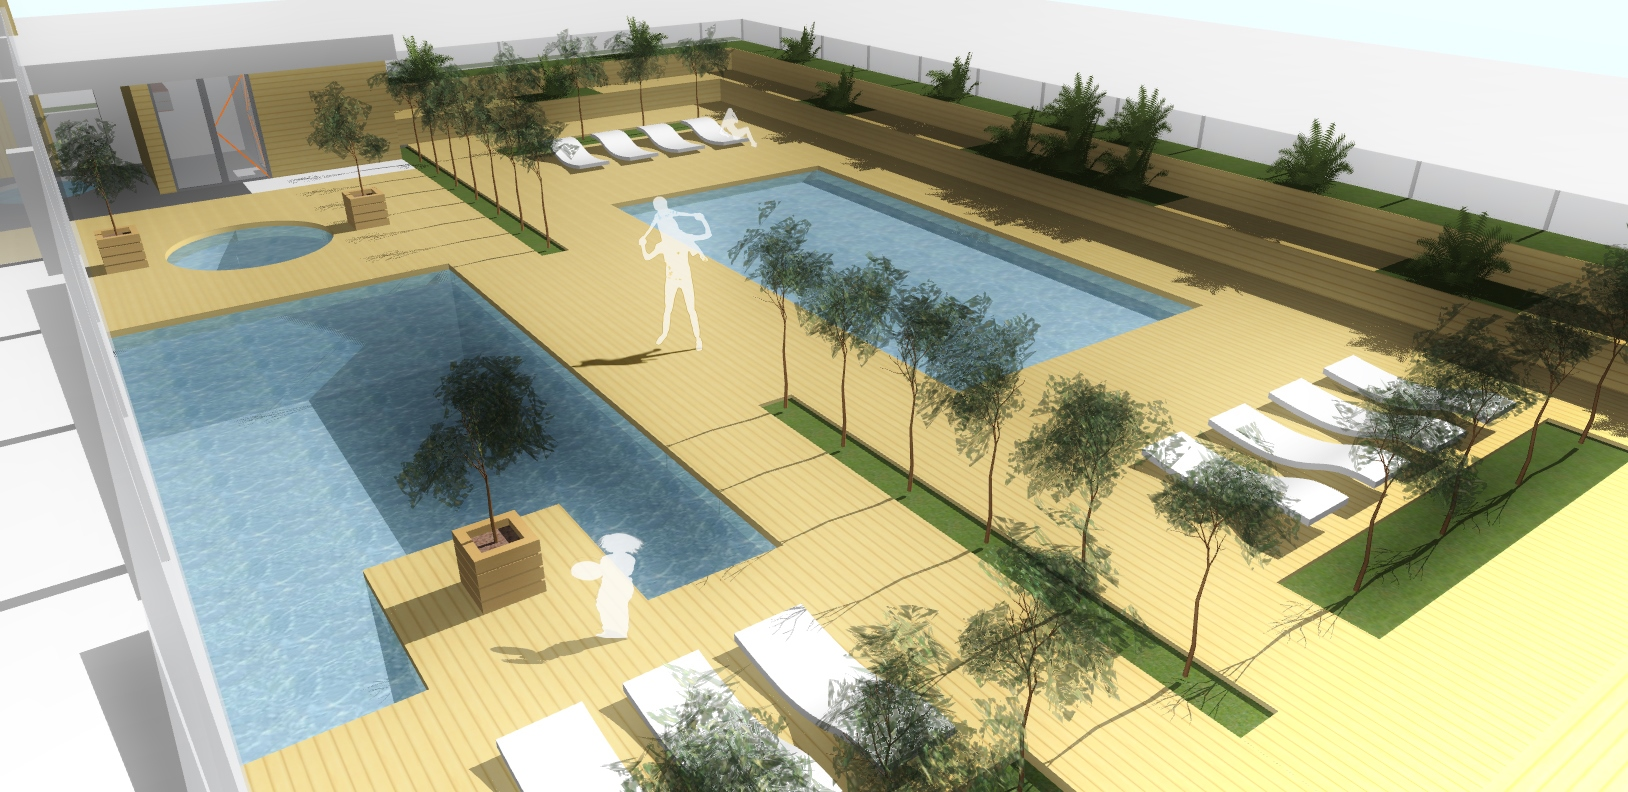 AQUAMARINA II - koncepcja budynku basenu aksonometria 2